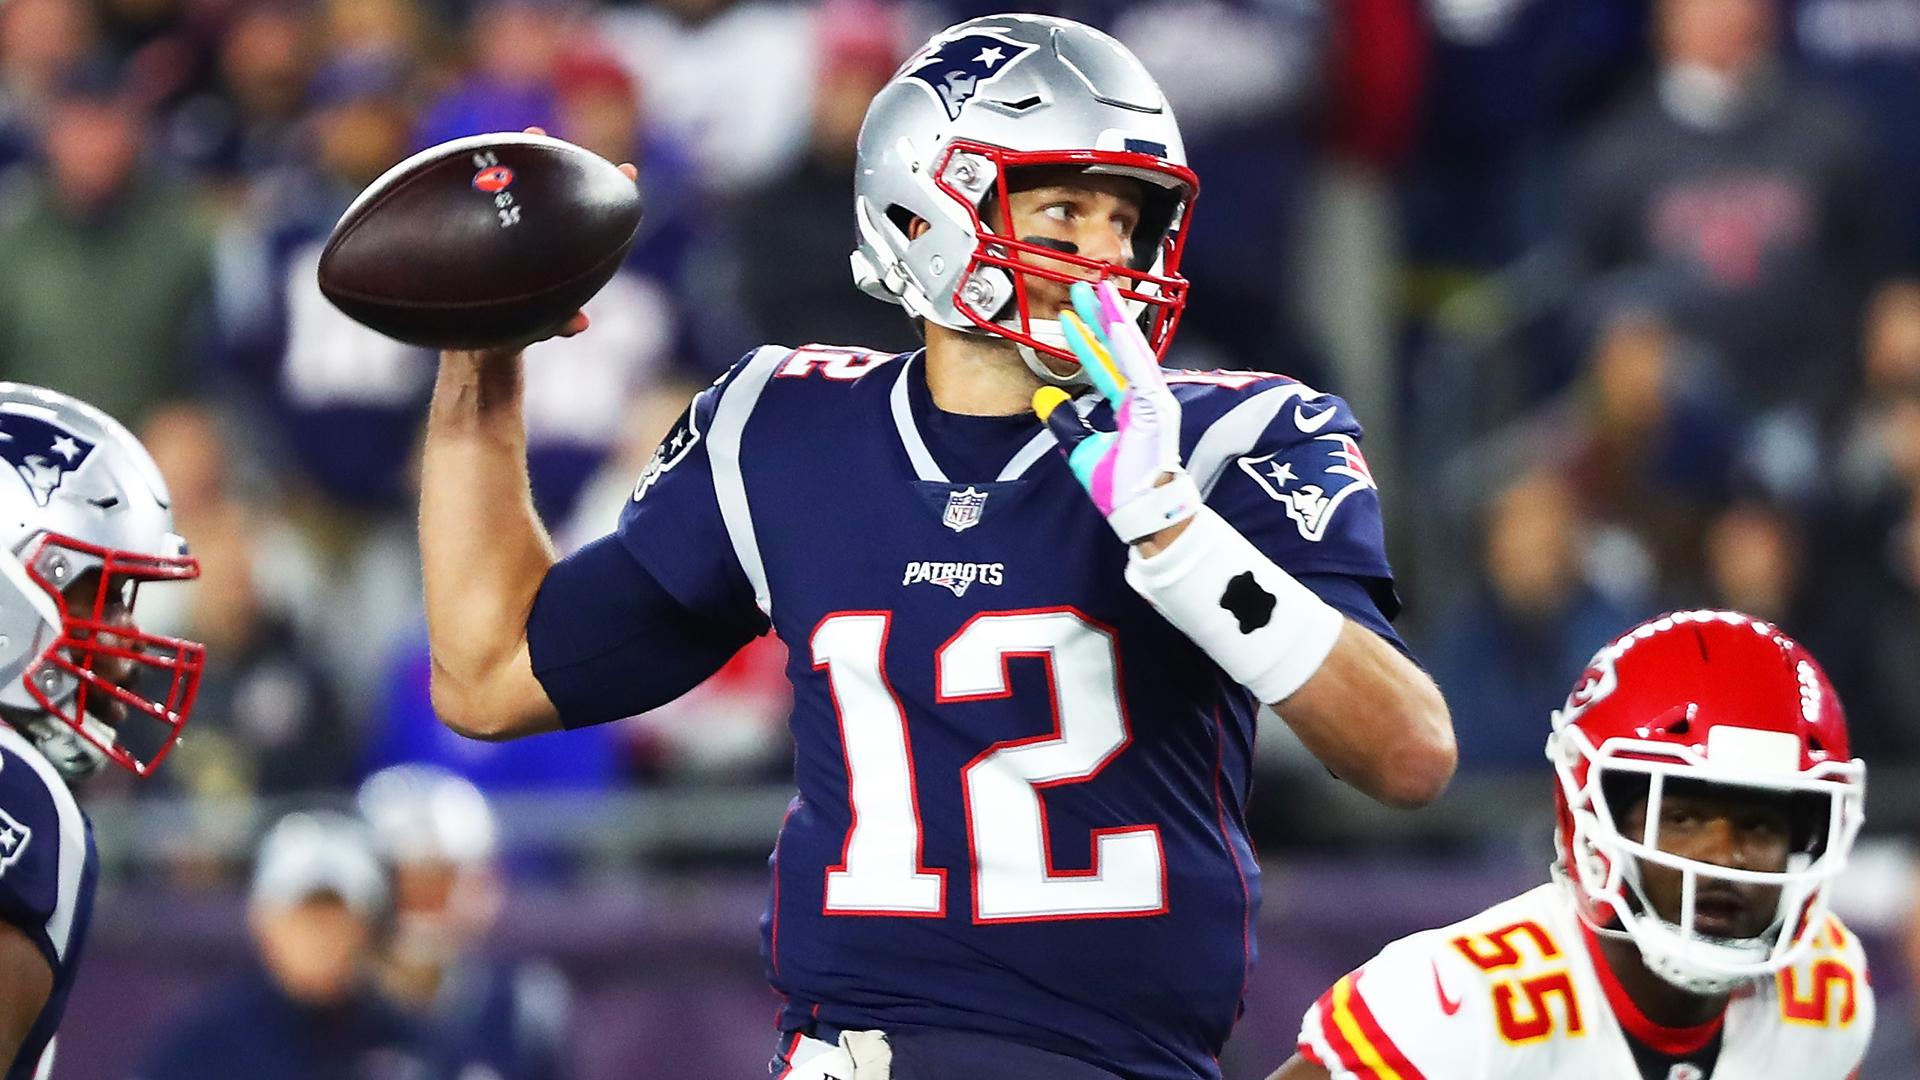 Gronk Body Slam >> Flipboard: Chiefs vs Patriots recap: Patrick Mahomes, Tom Brady collide in shootout